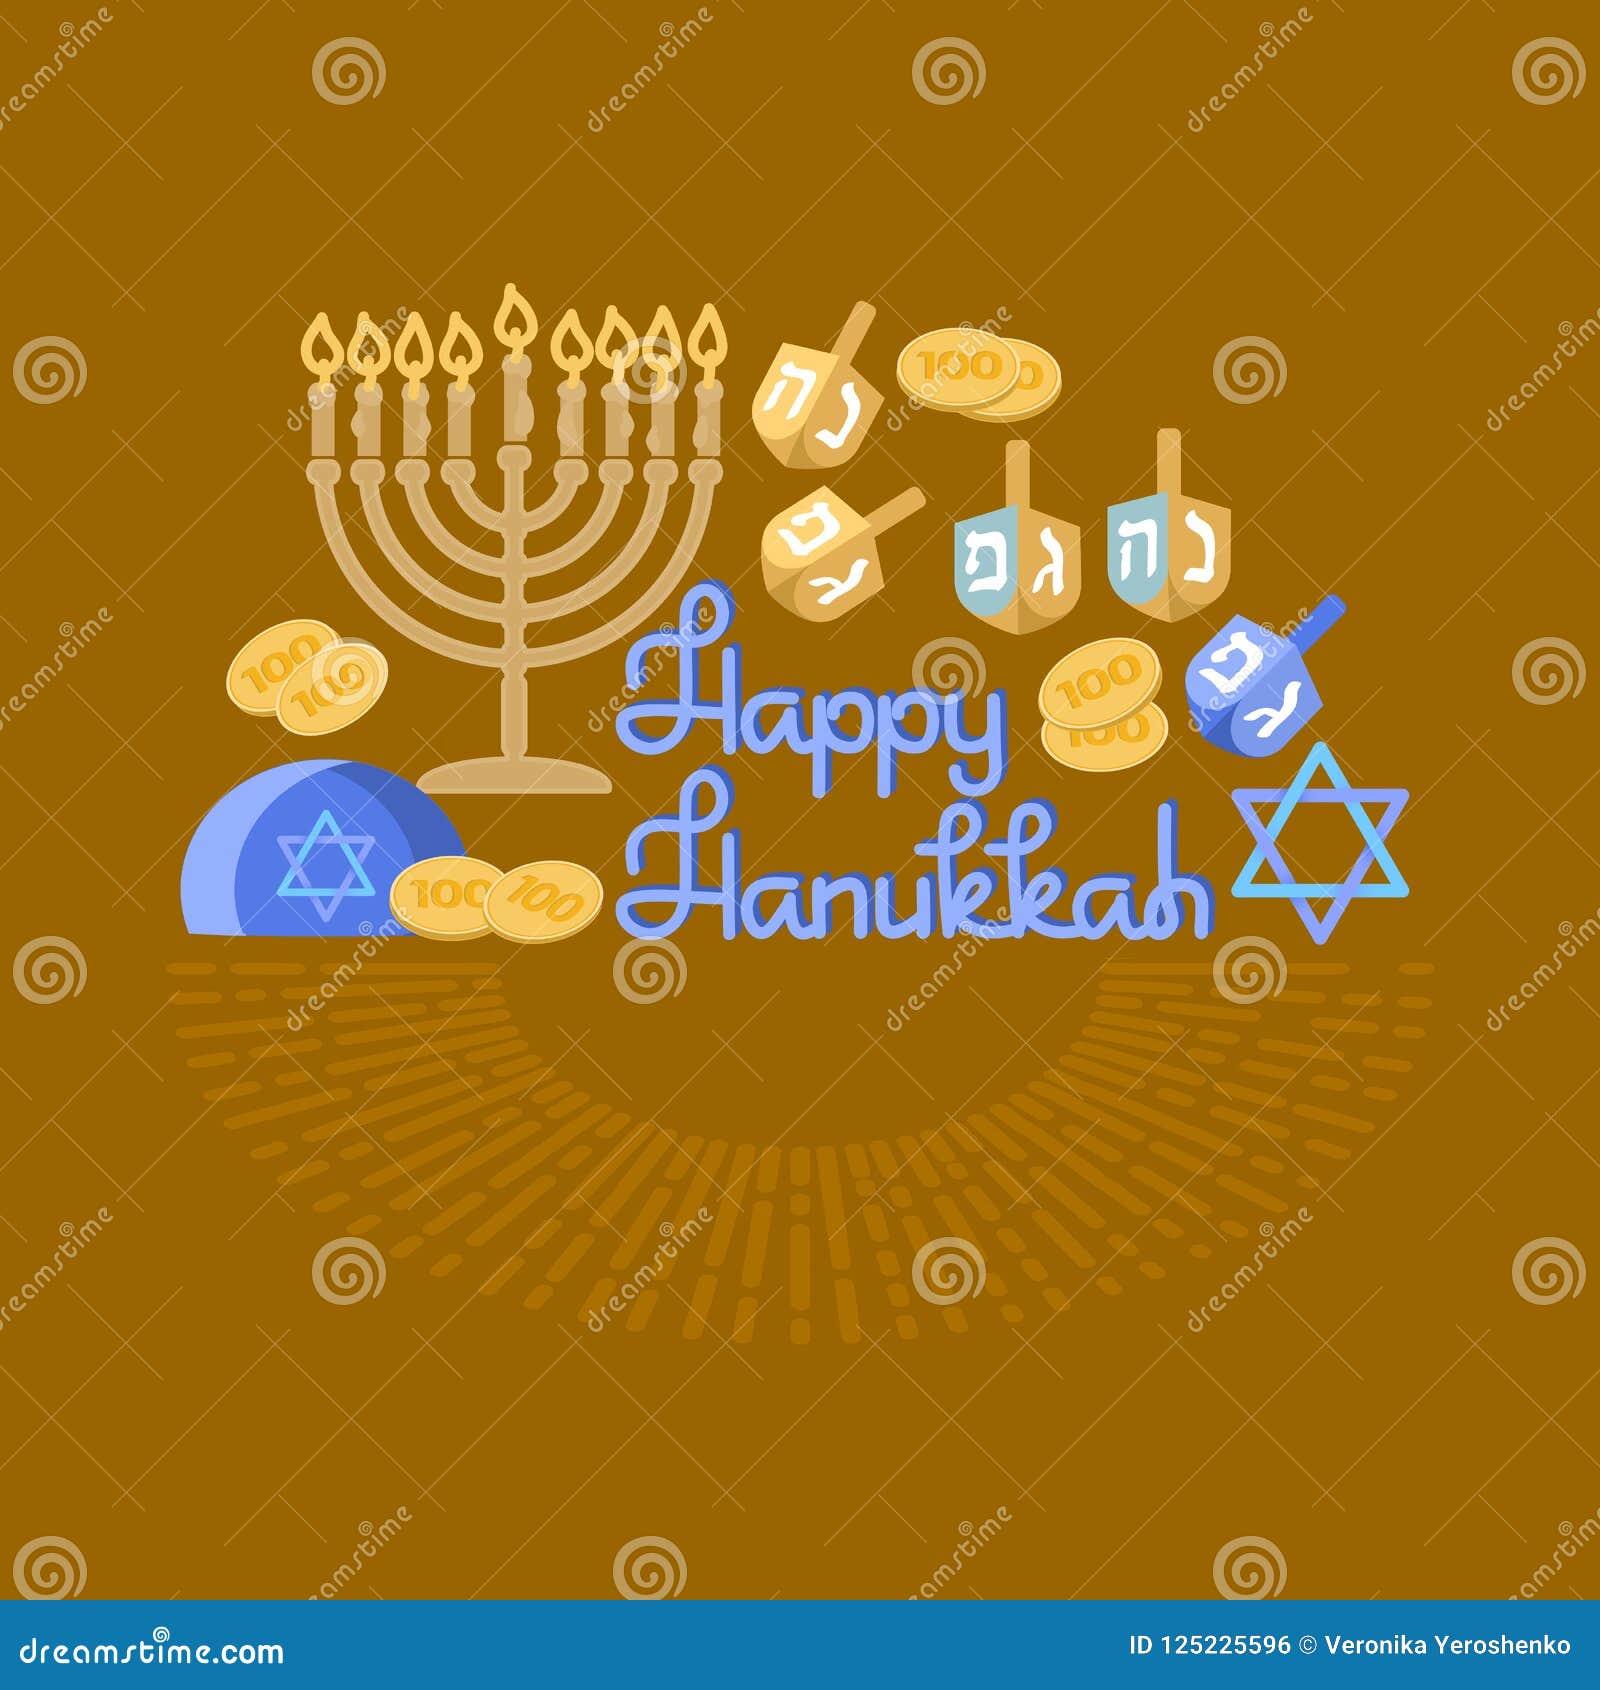 Hanukkah Greeting Card Jewish Holiday Vector Illustration Stock